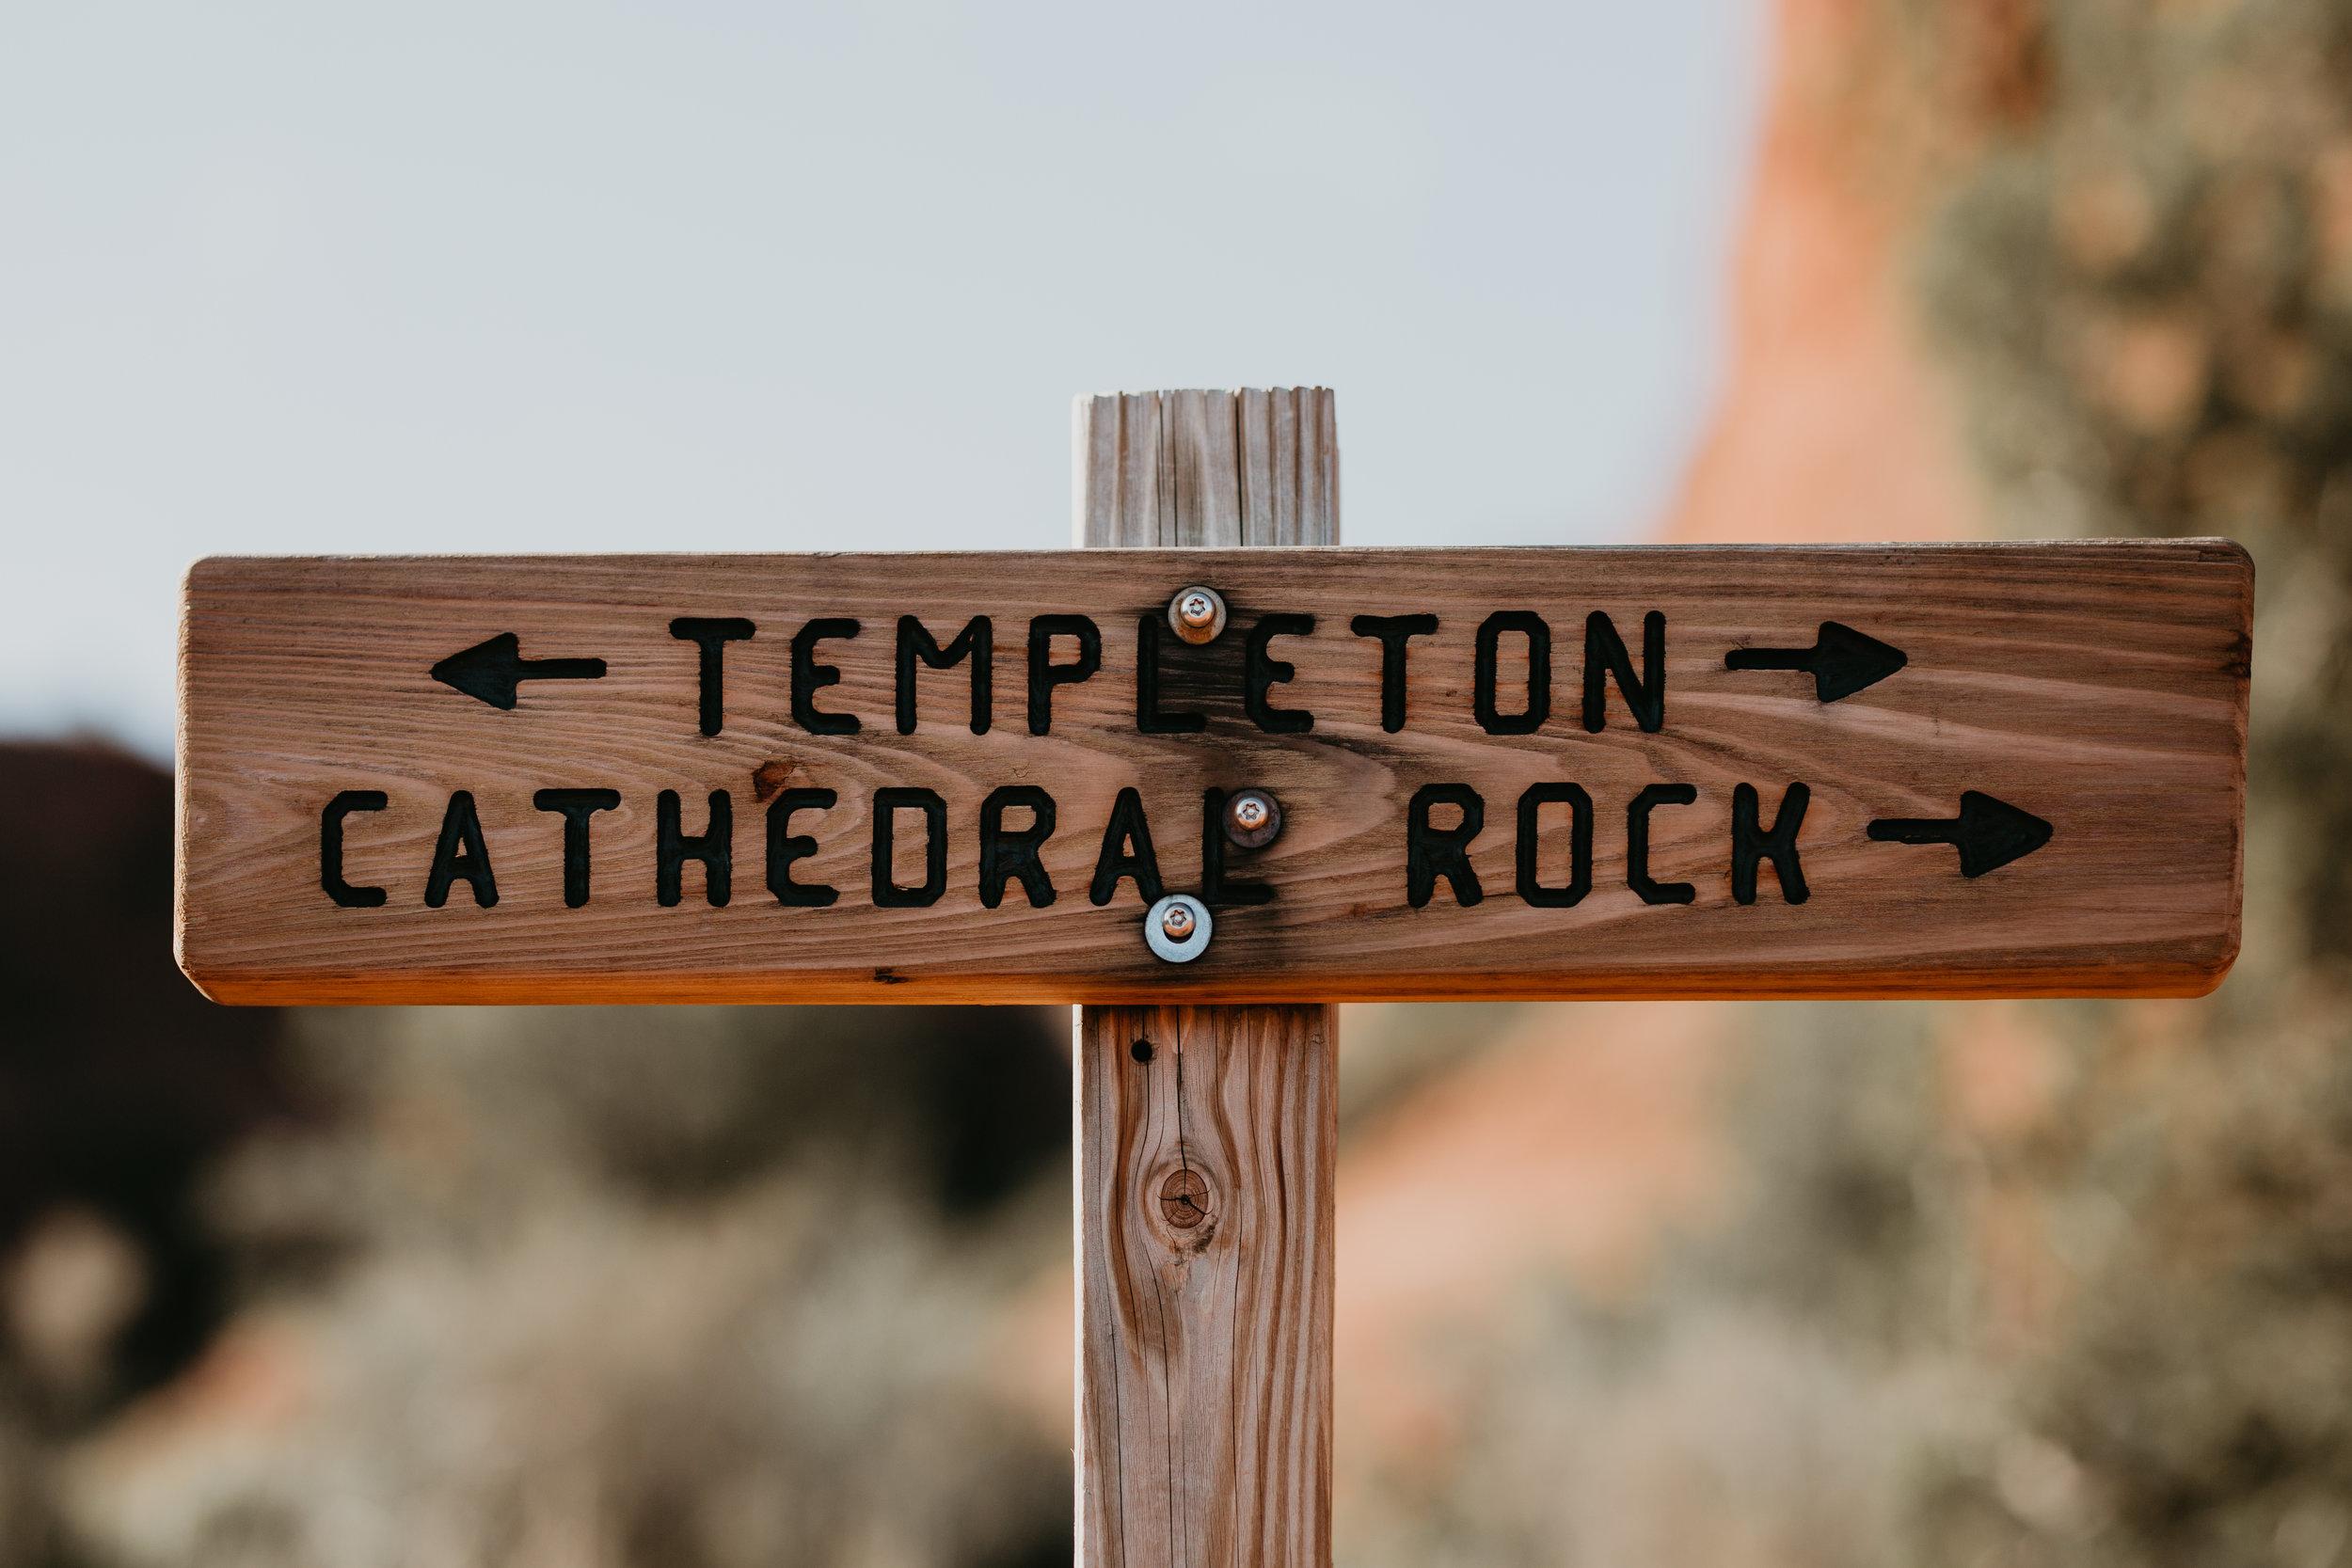 nicole-daacke-photography-sedona-arizona-destination-elopement-wedding-photographer-catherdral-rock-hiking-elopement-sedona-river-elopement-photos-desert-rock-wedding-photographer-laid-back-spontaneous-elopement-75.jpg